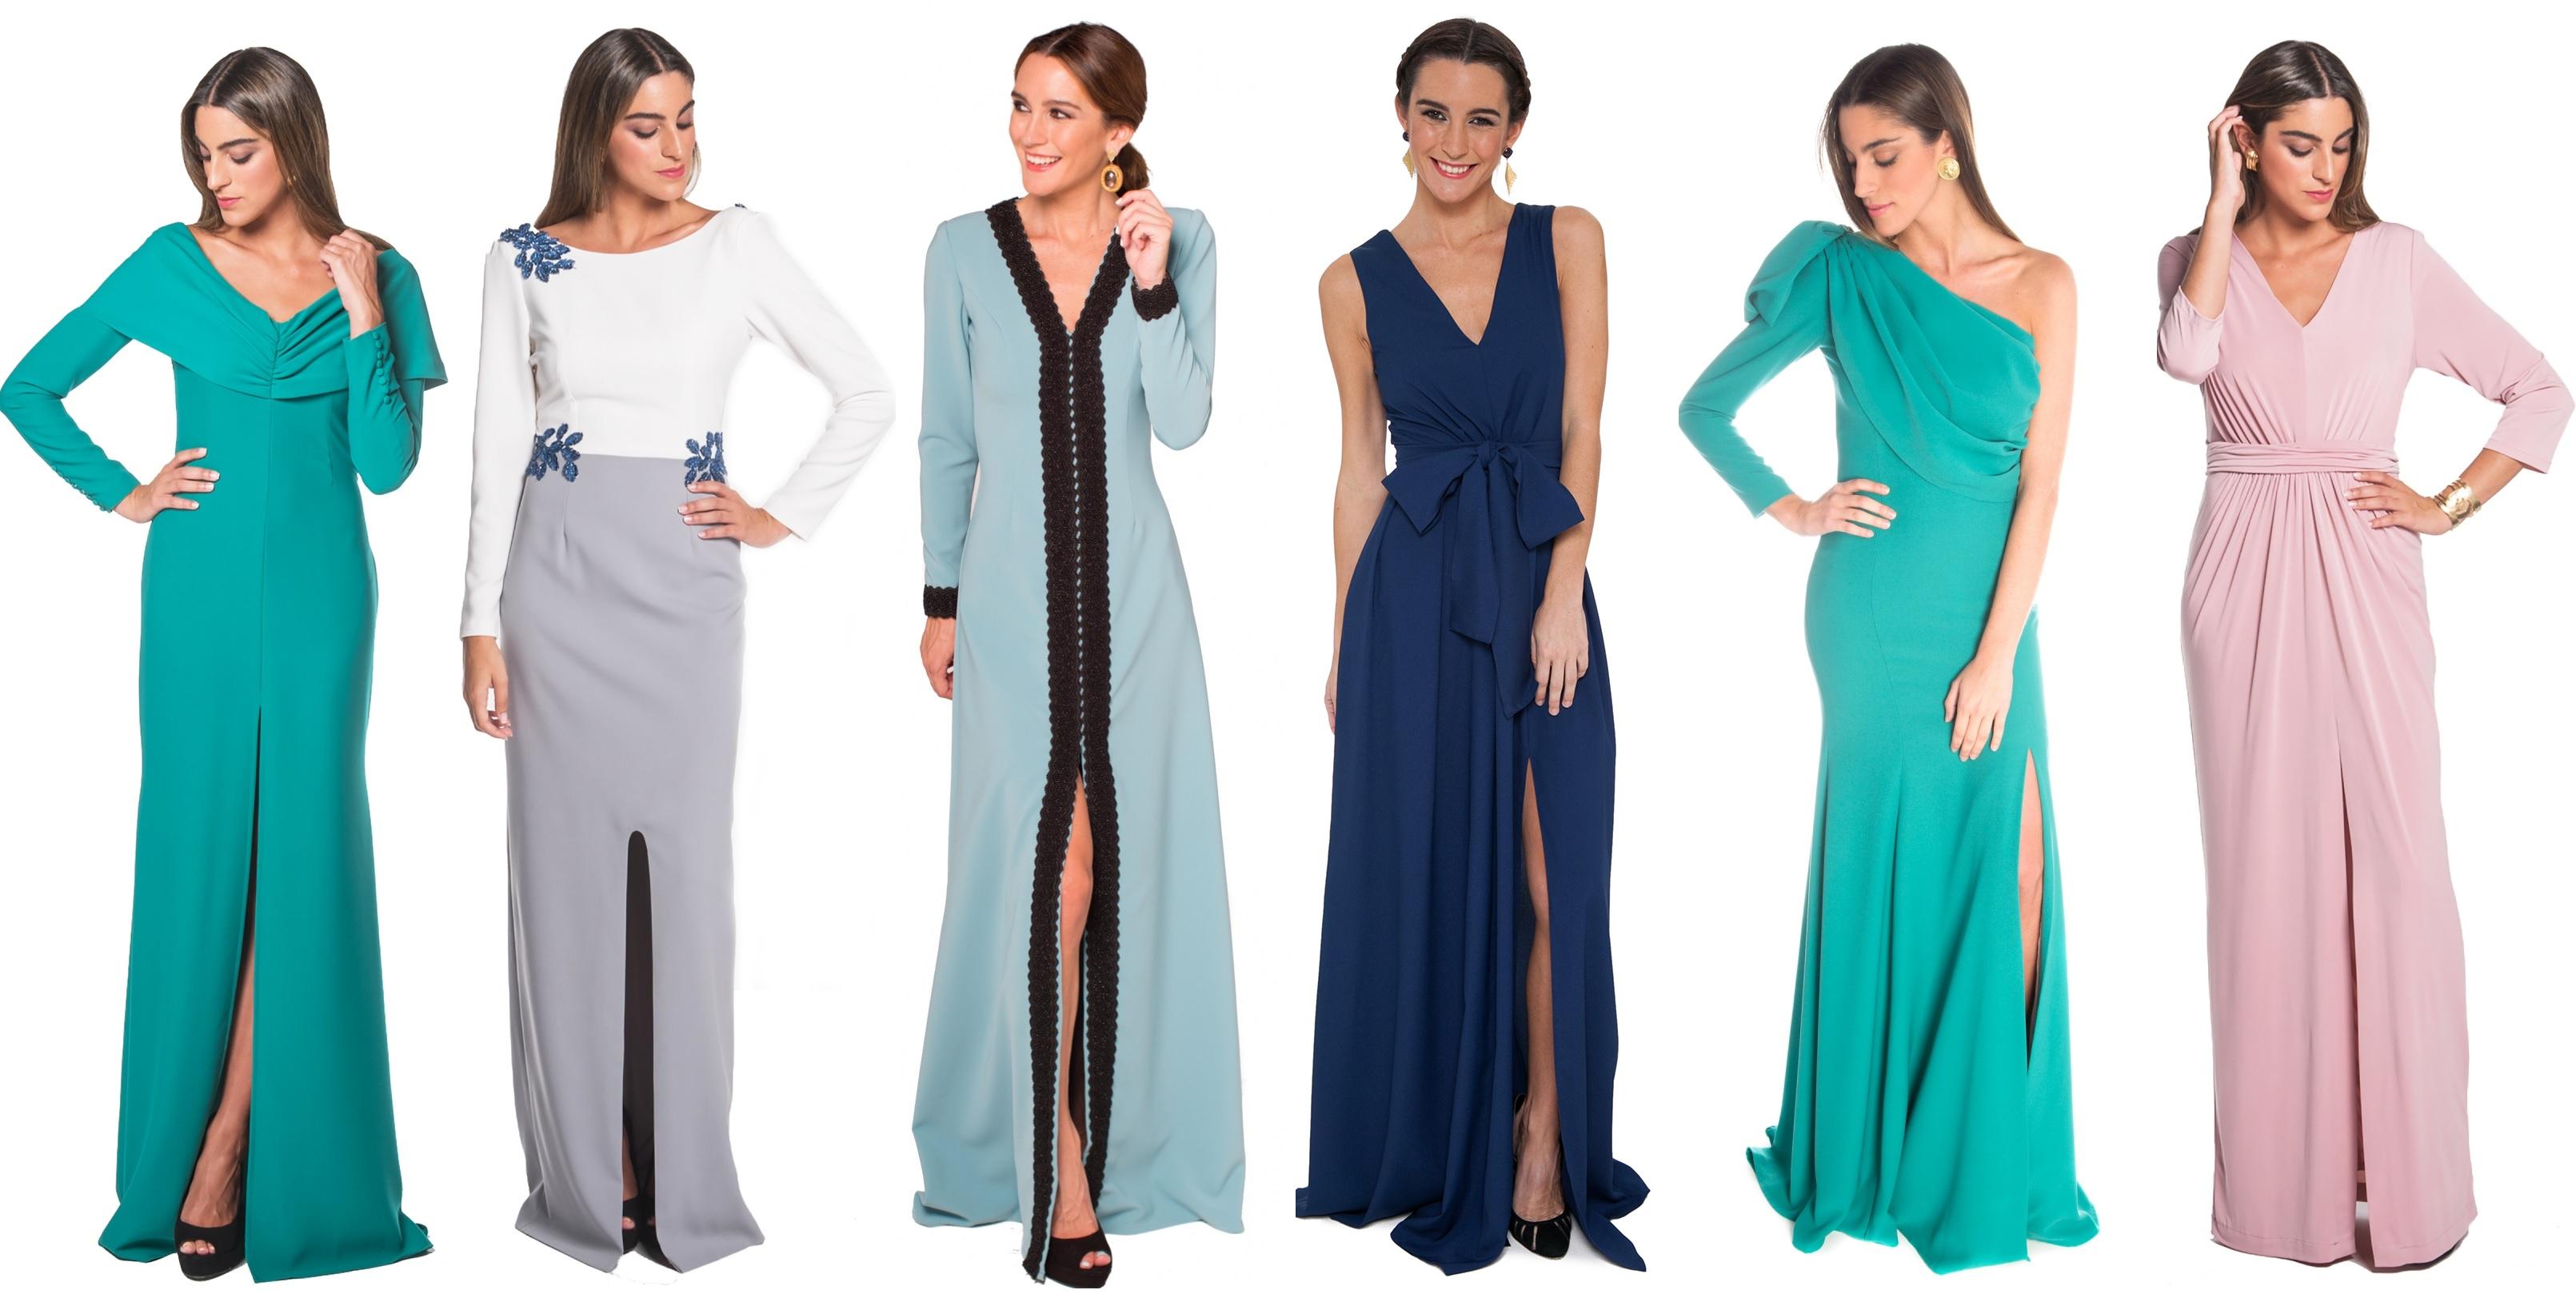 vestidos largos para madrina lamasmona